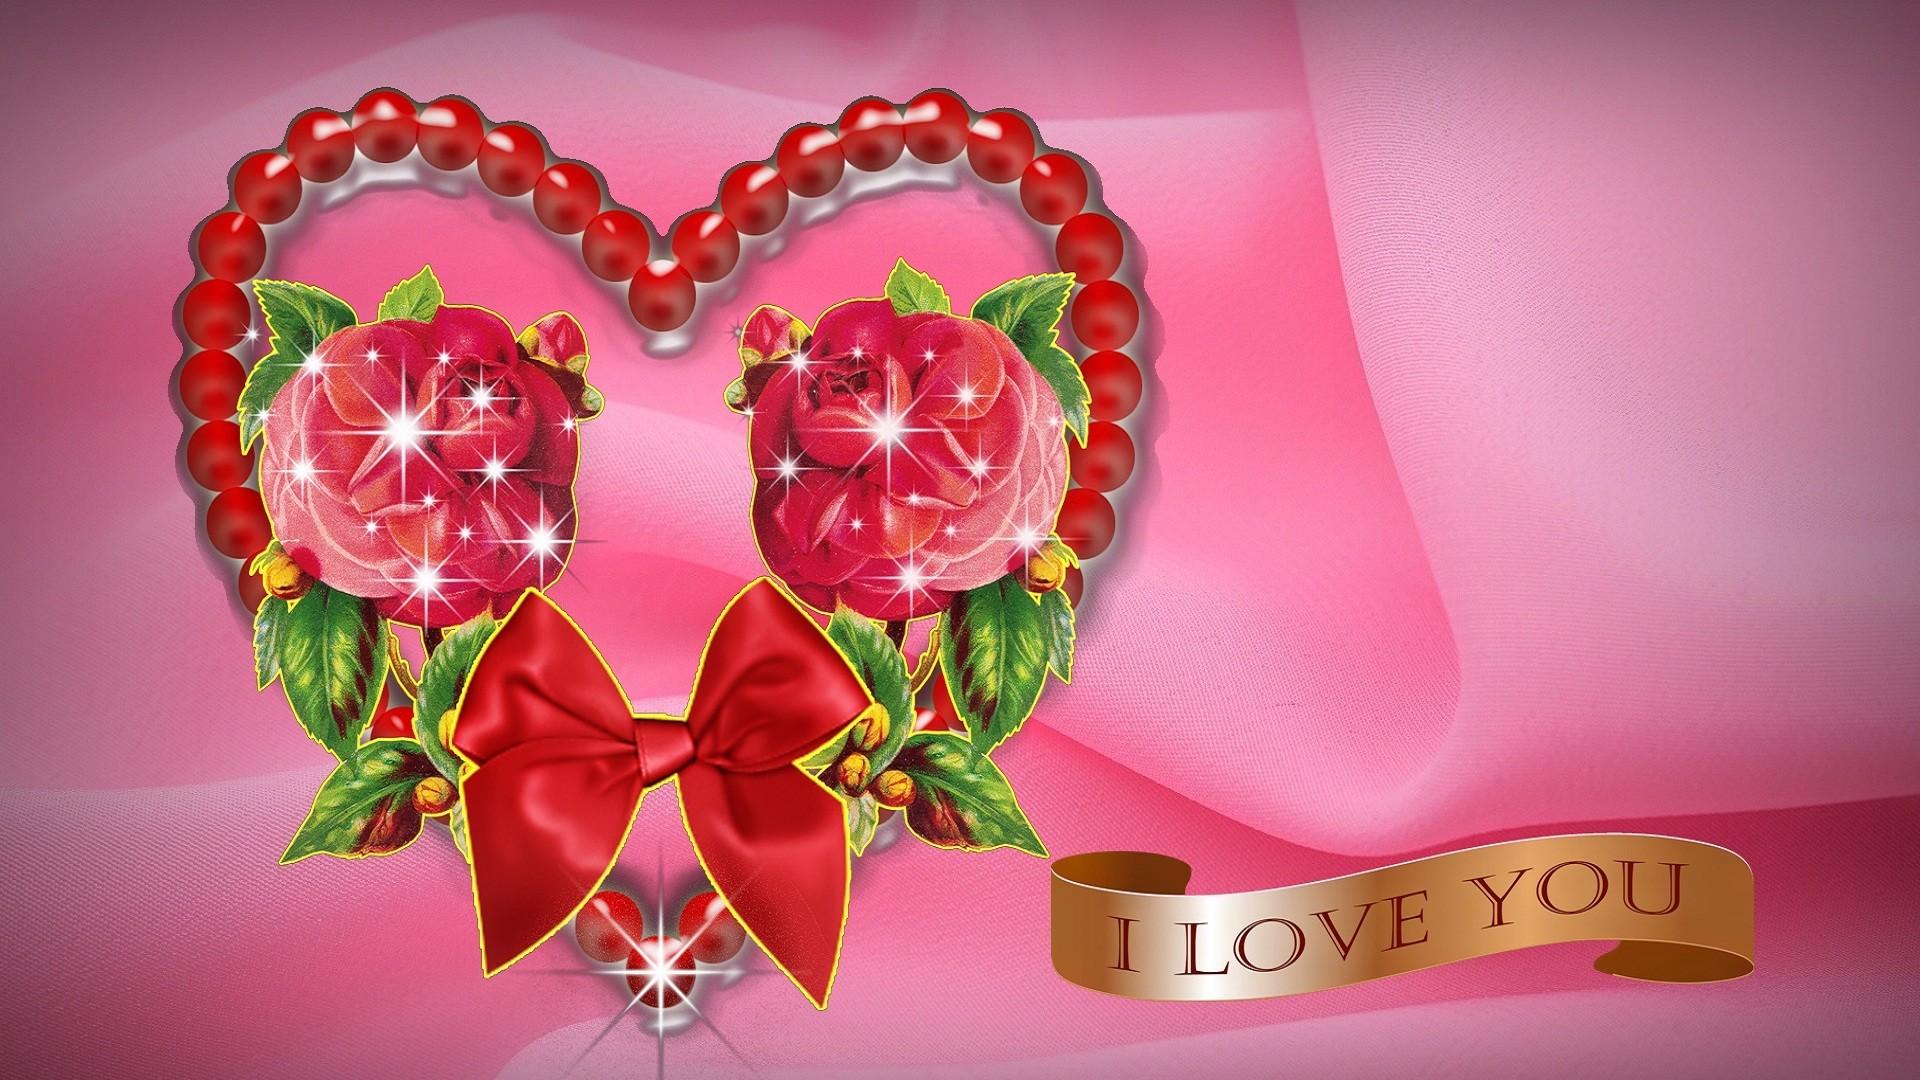 Love Rose HD Wallpapers Hot HD Wallpapers Pinterest Flower